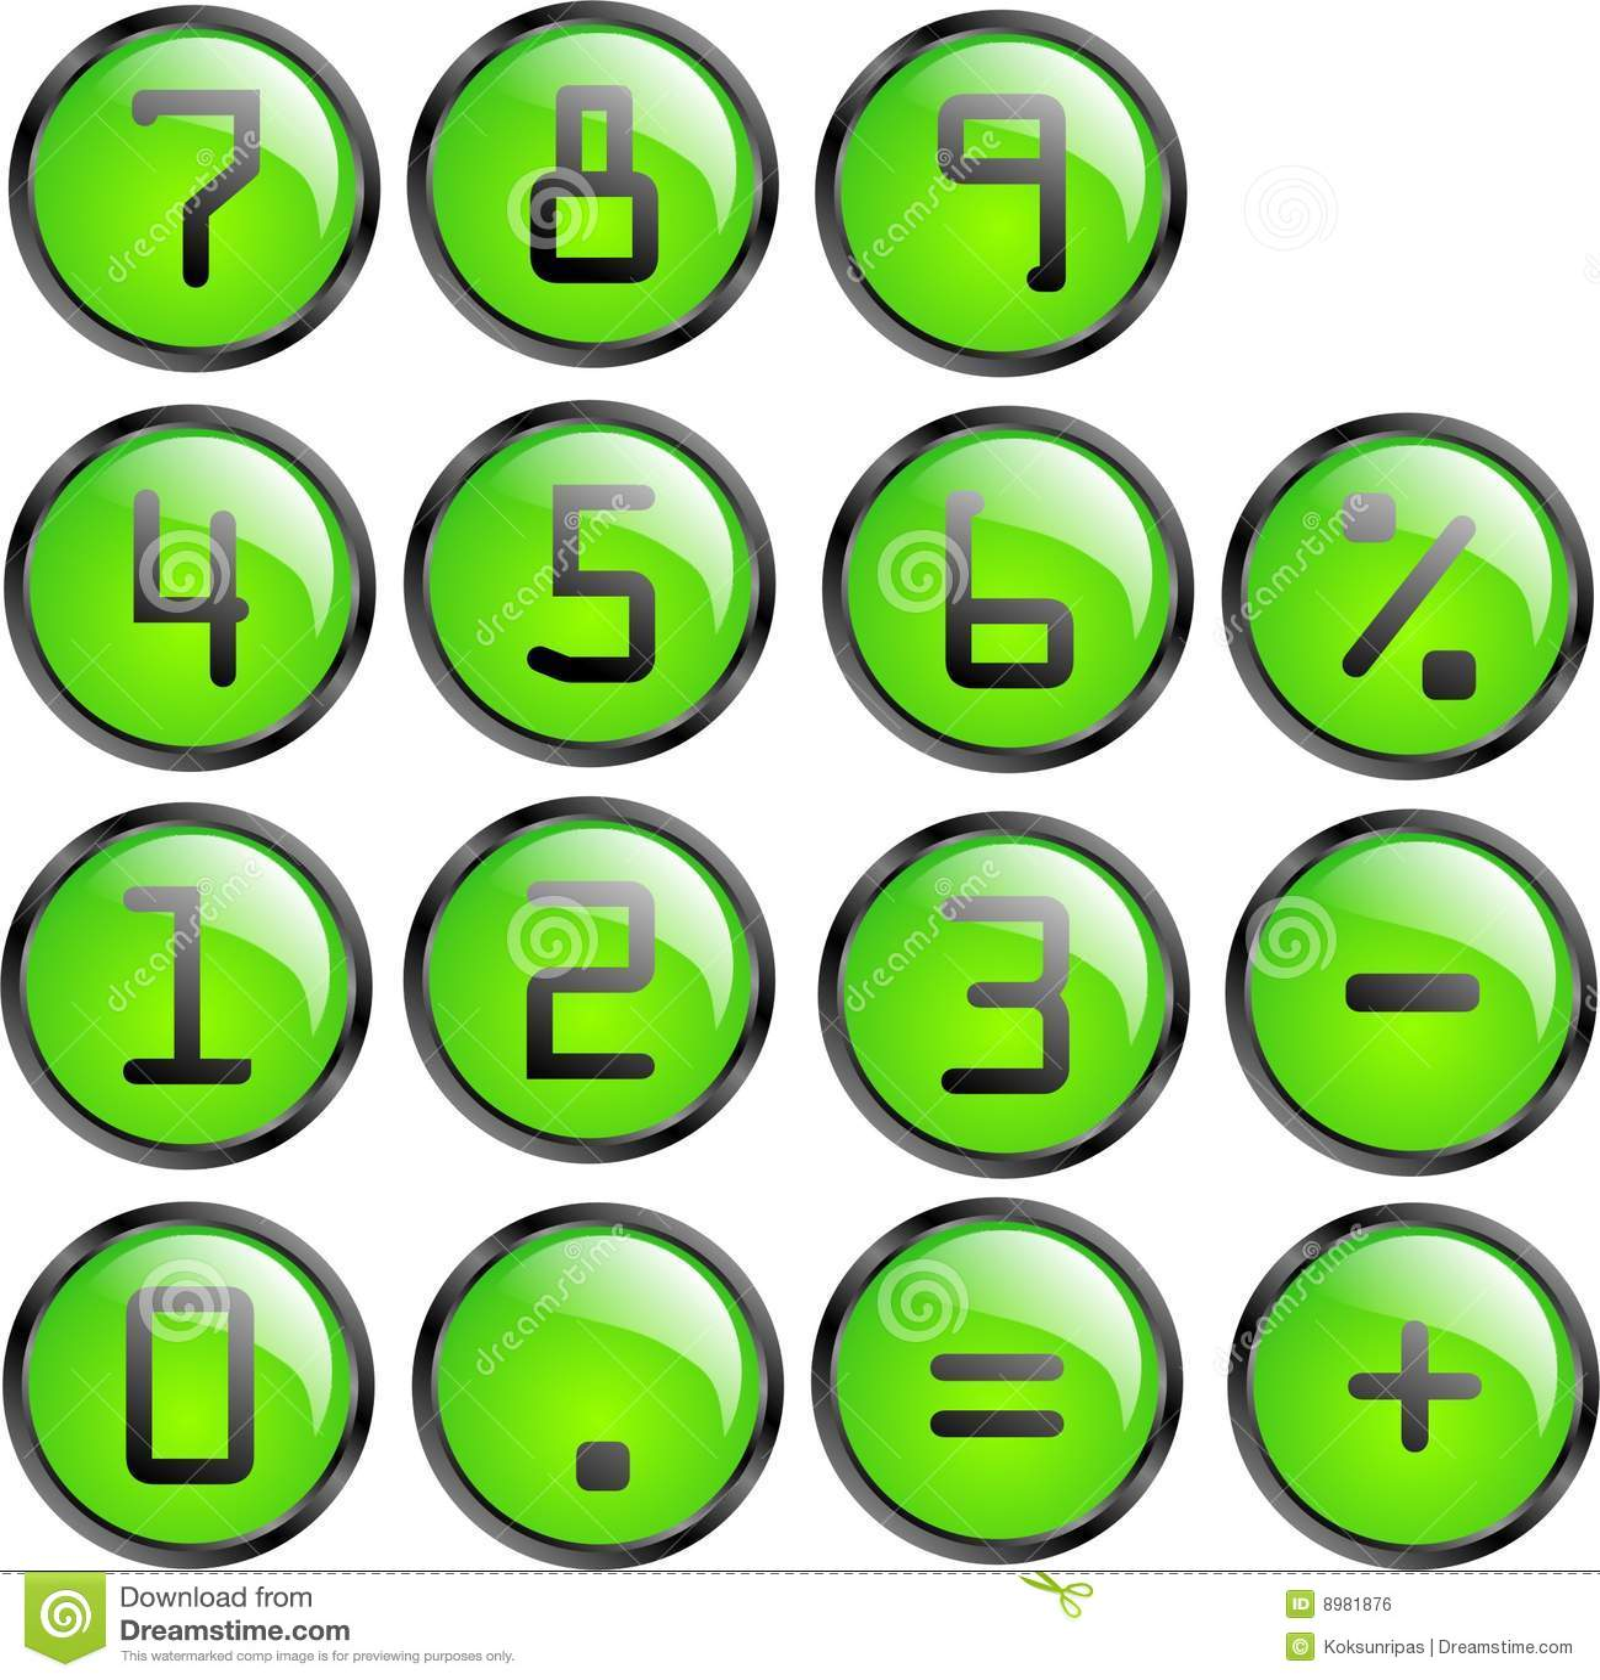 Vector calculator buttons stock vector  Illustration of shine - 8981876